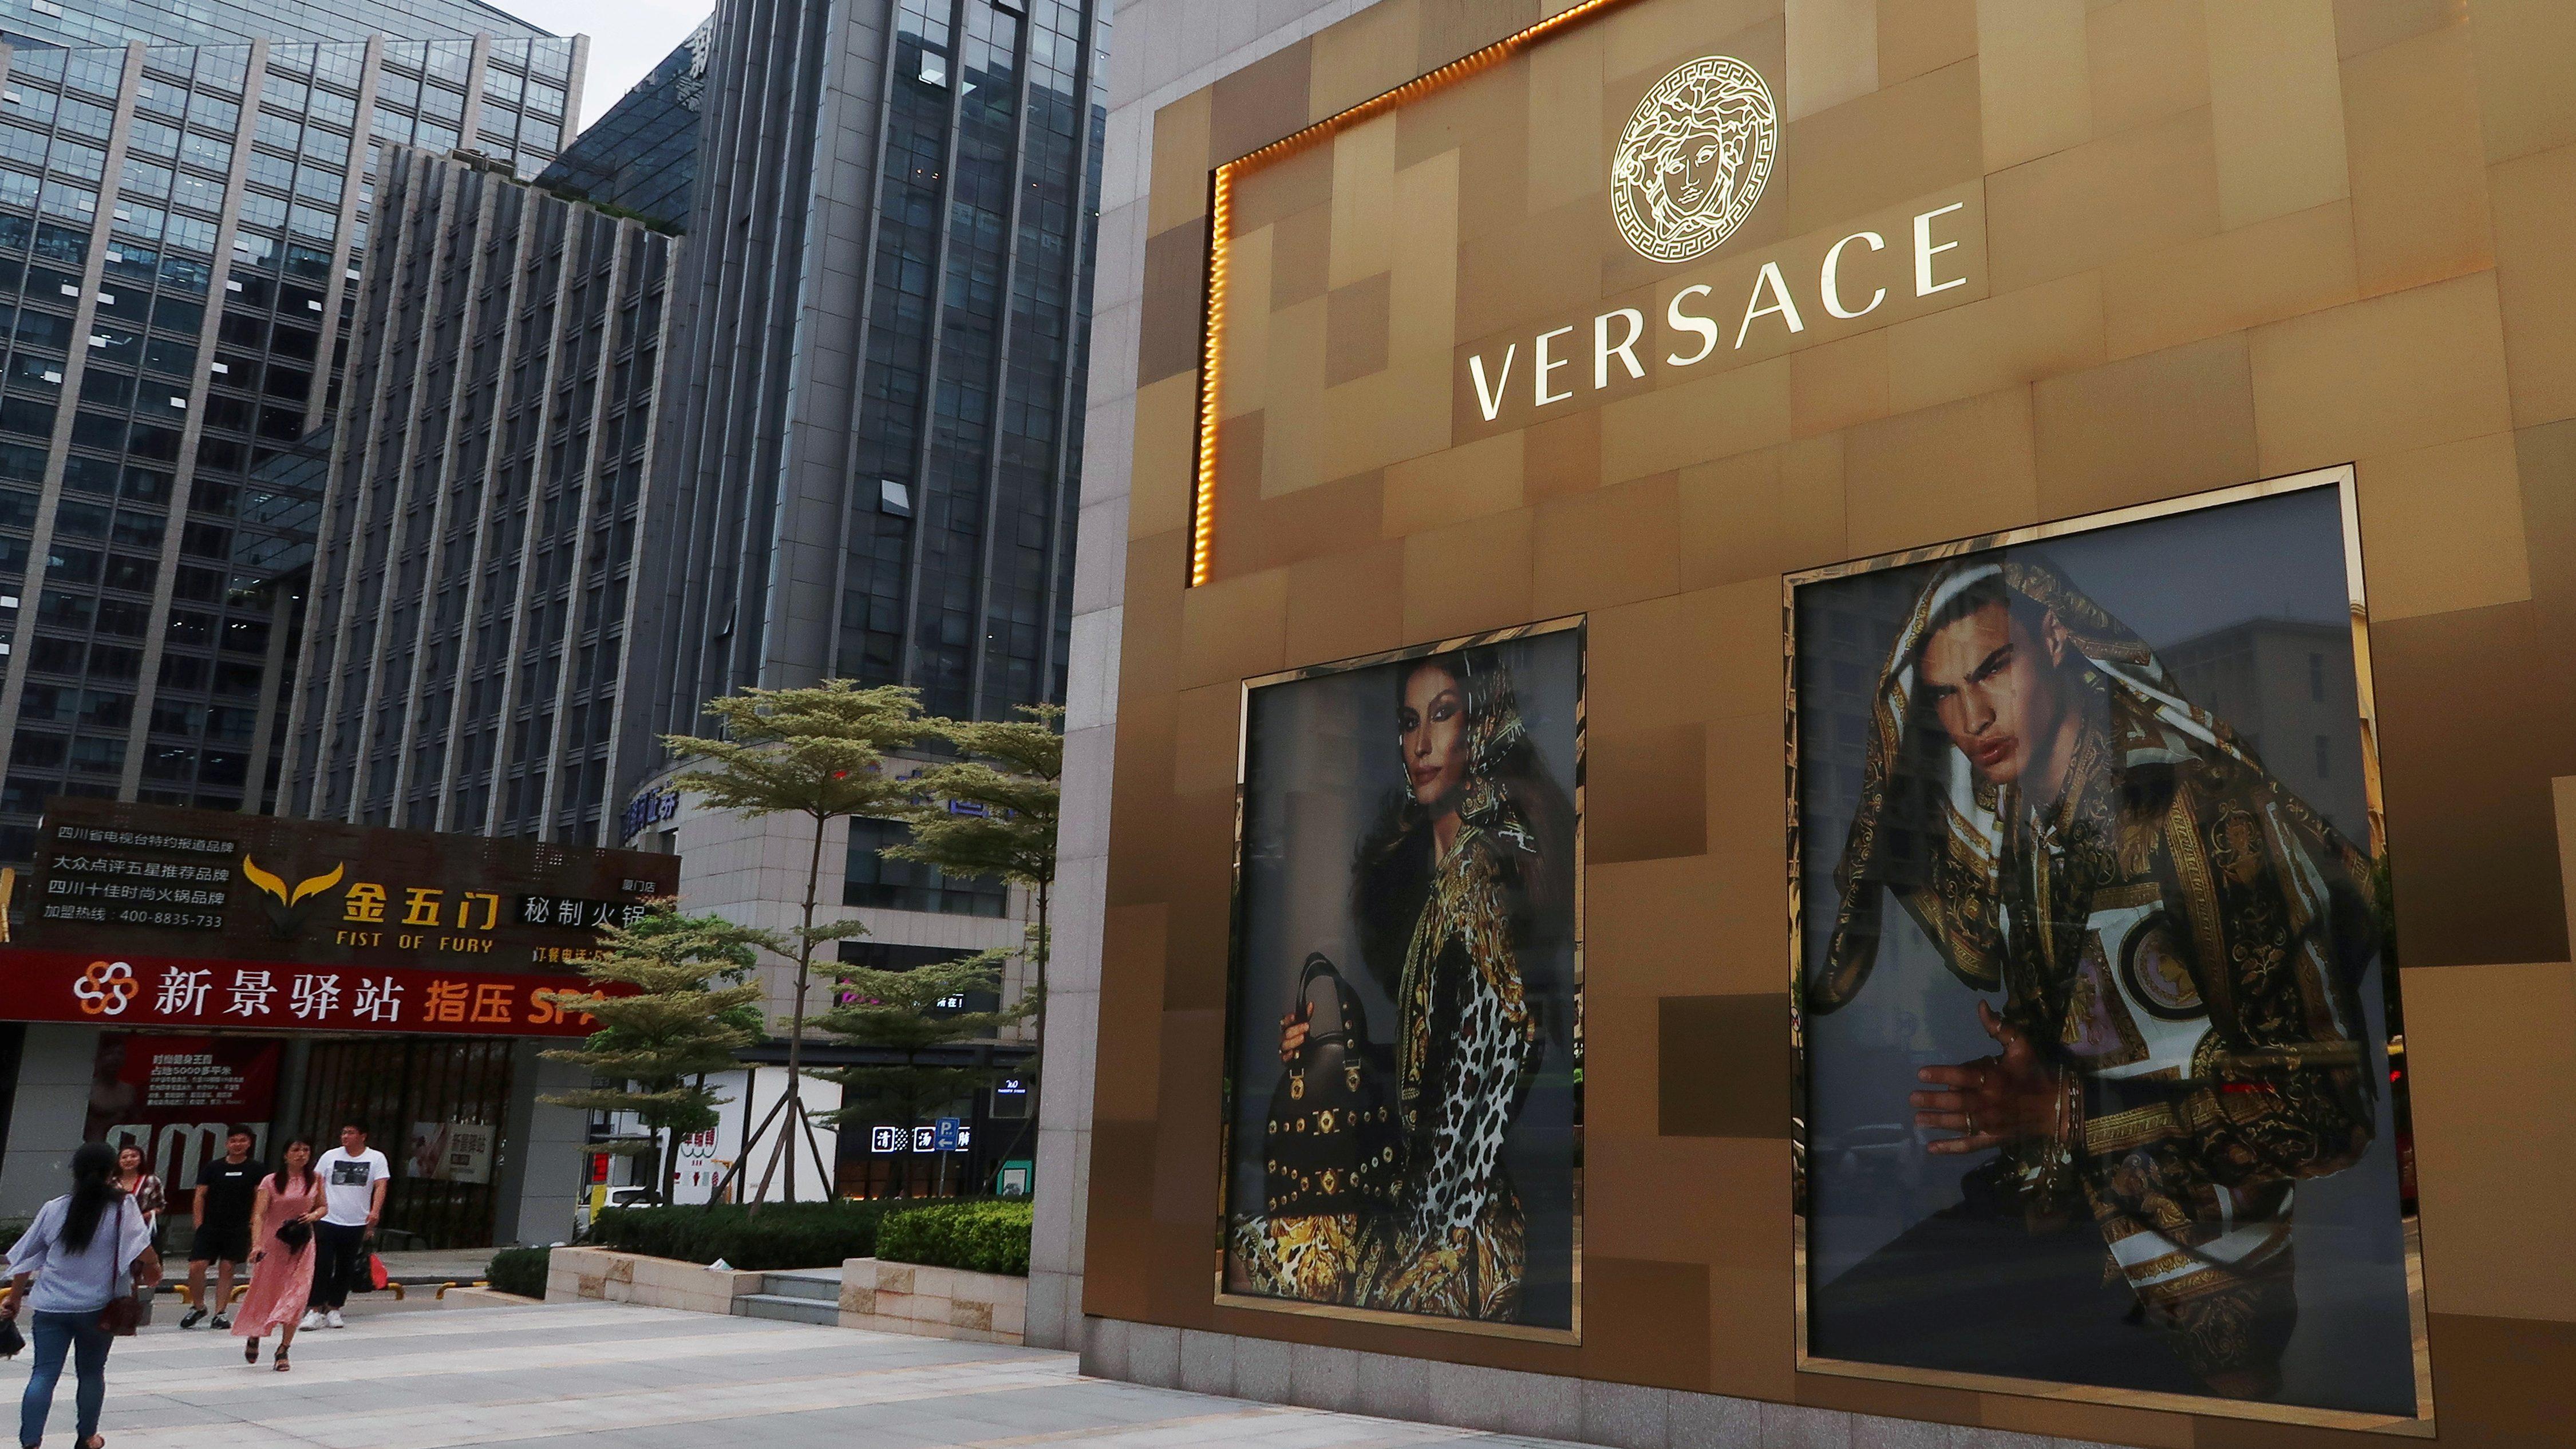 Shopping windows of Italian luxury brand Versace are seen outside a shopping mall in Xiamen, Fujian province.